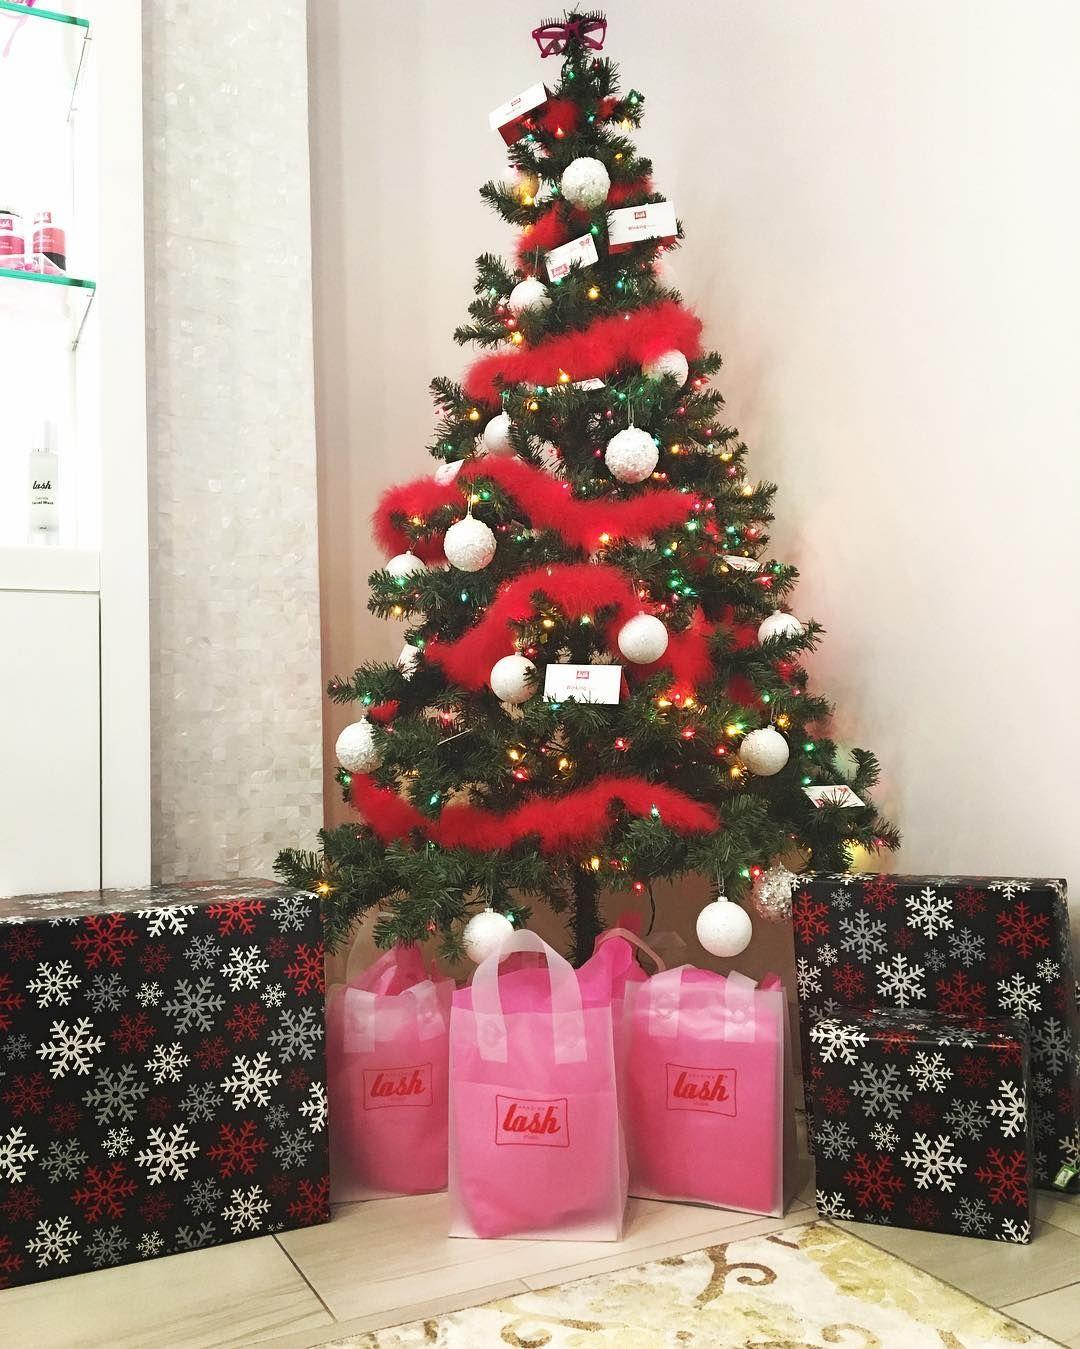 Santa came early!! Thank you so much  for our amazing gifts  #amazinglashtempe #ALSTempe #Thankful #amazinglashstudiotempe